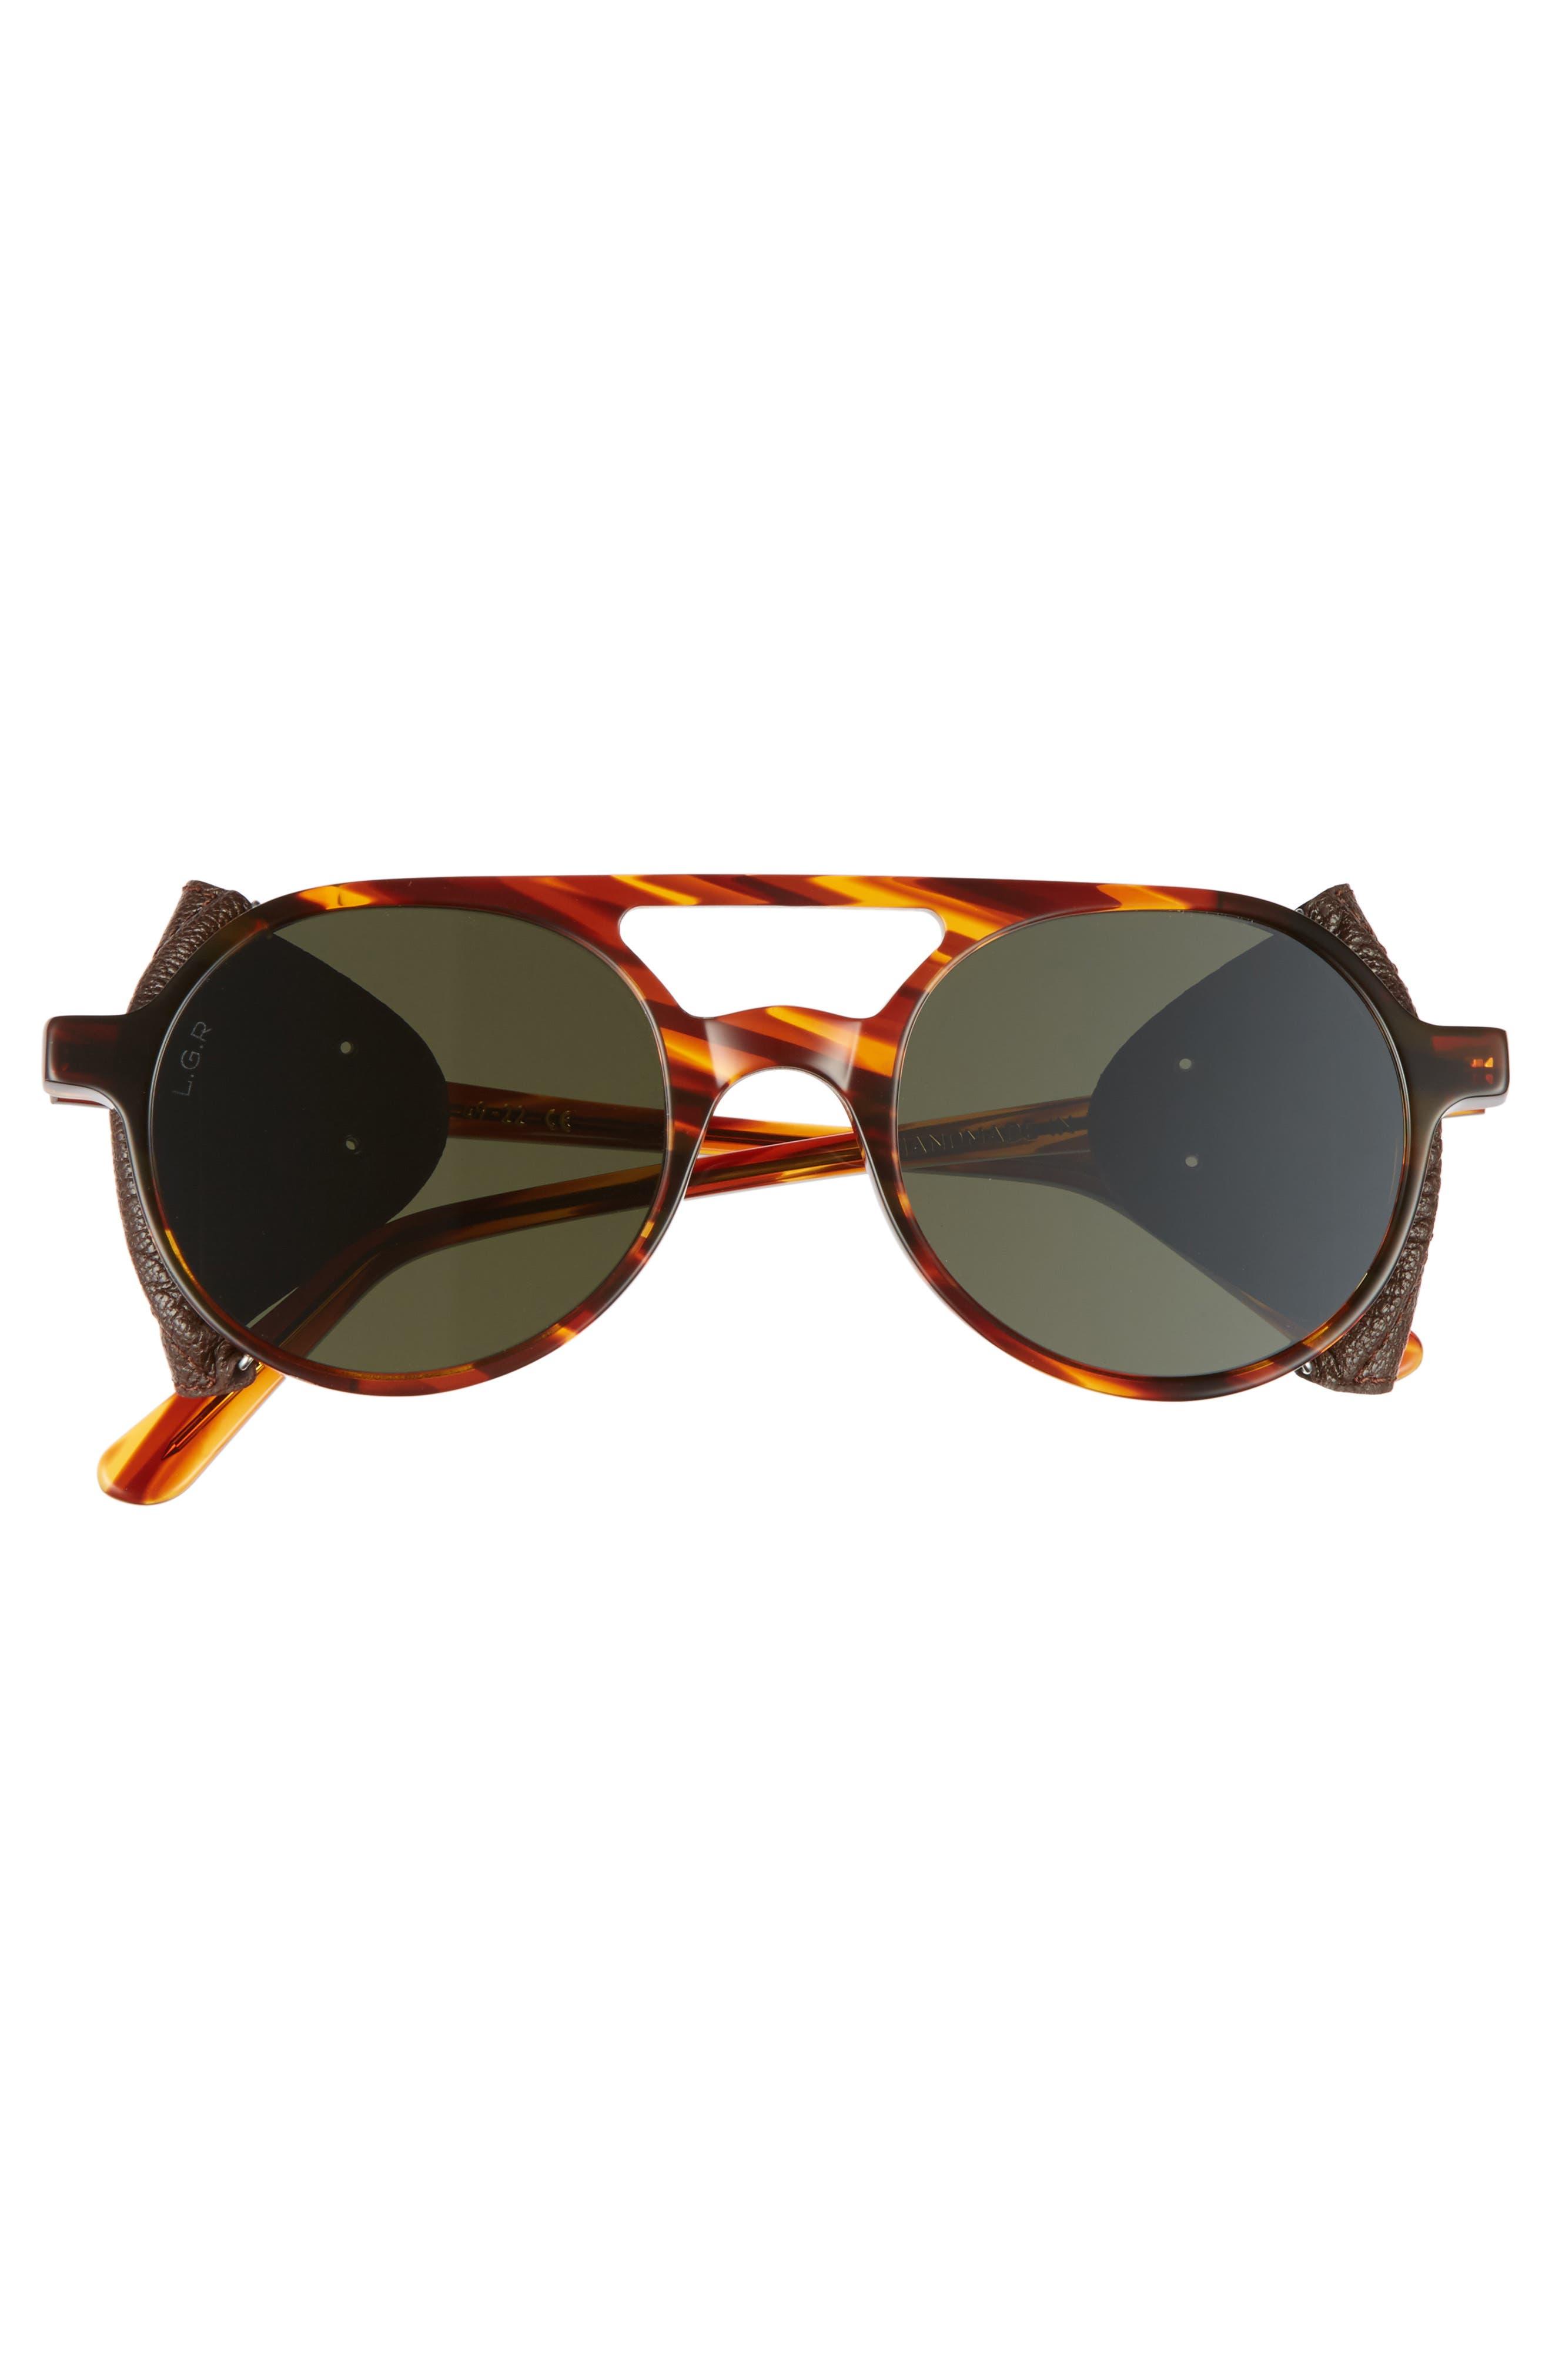 Reunion II 49mm Sunglasses,                             Alternate thumbnail 2, color,                             200